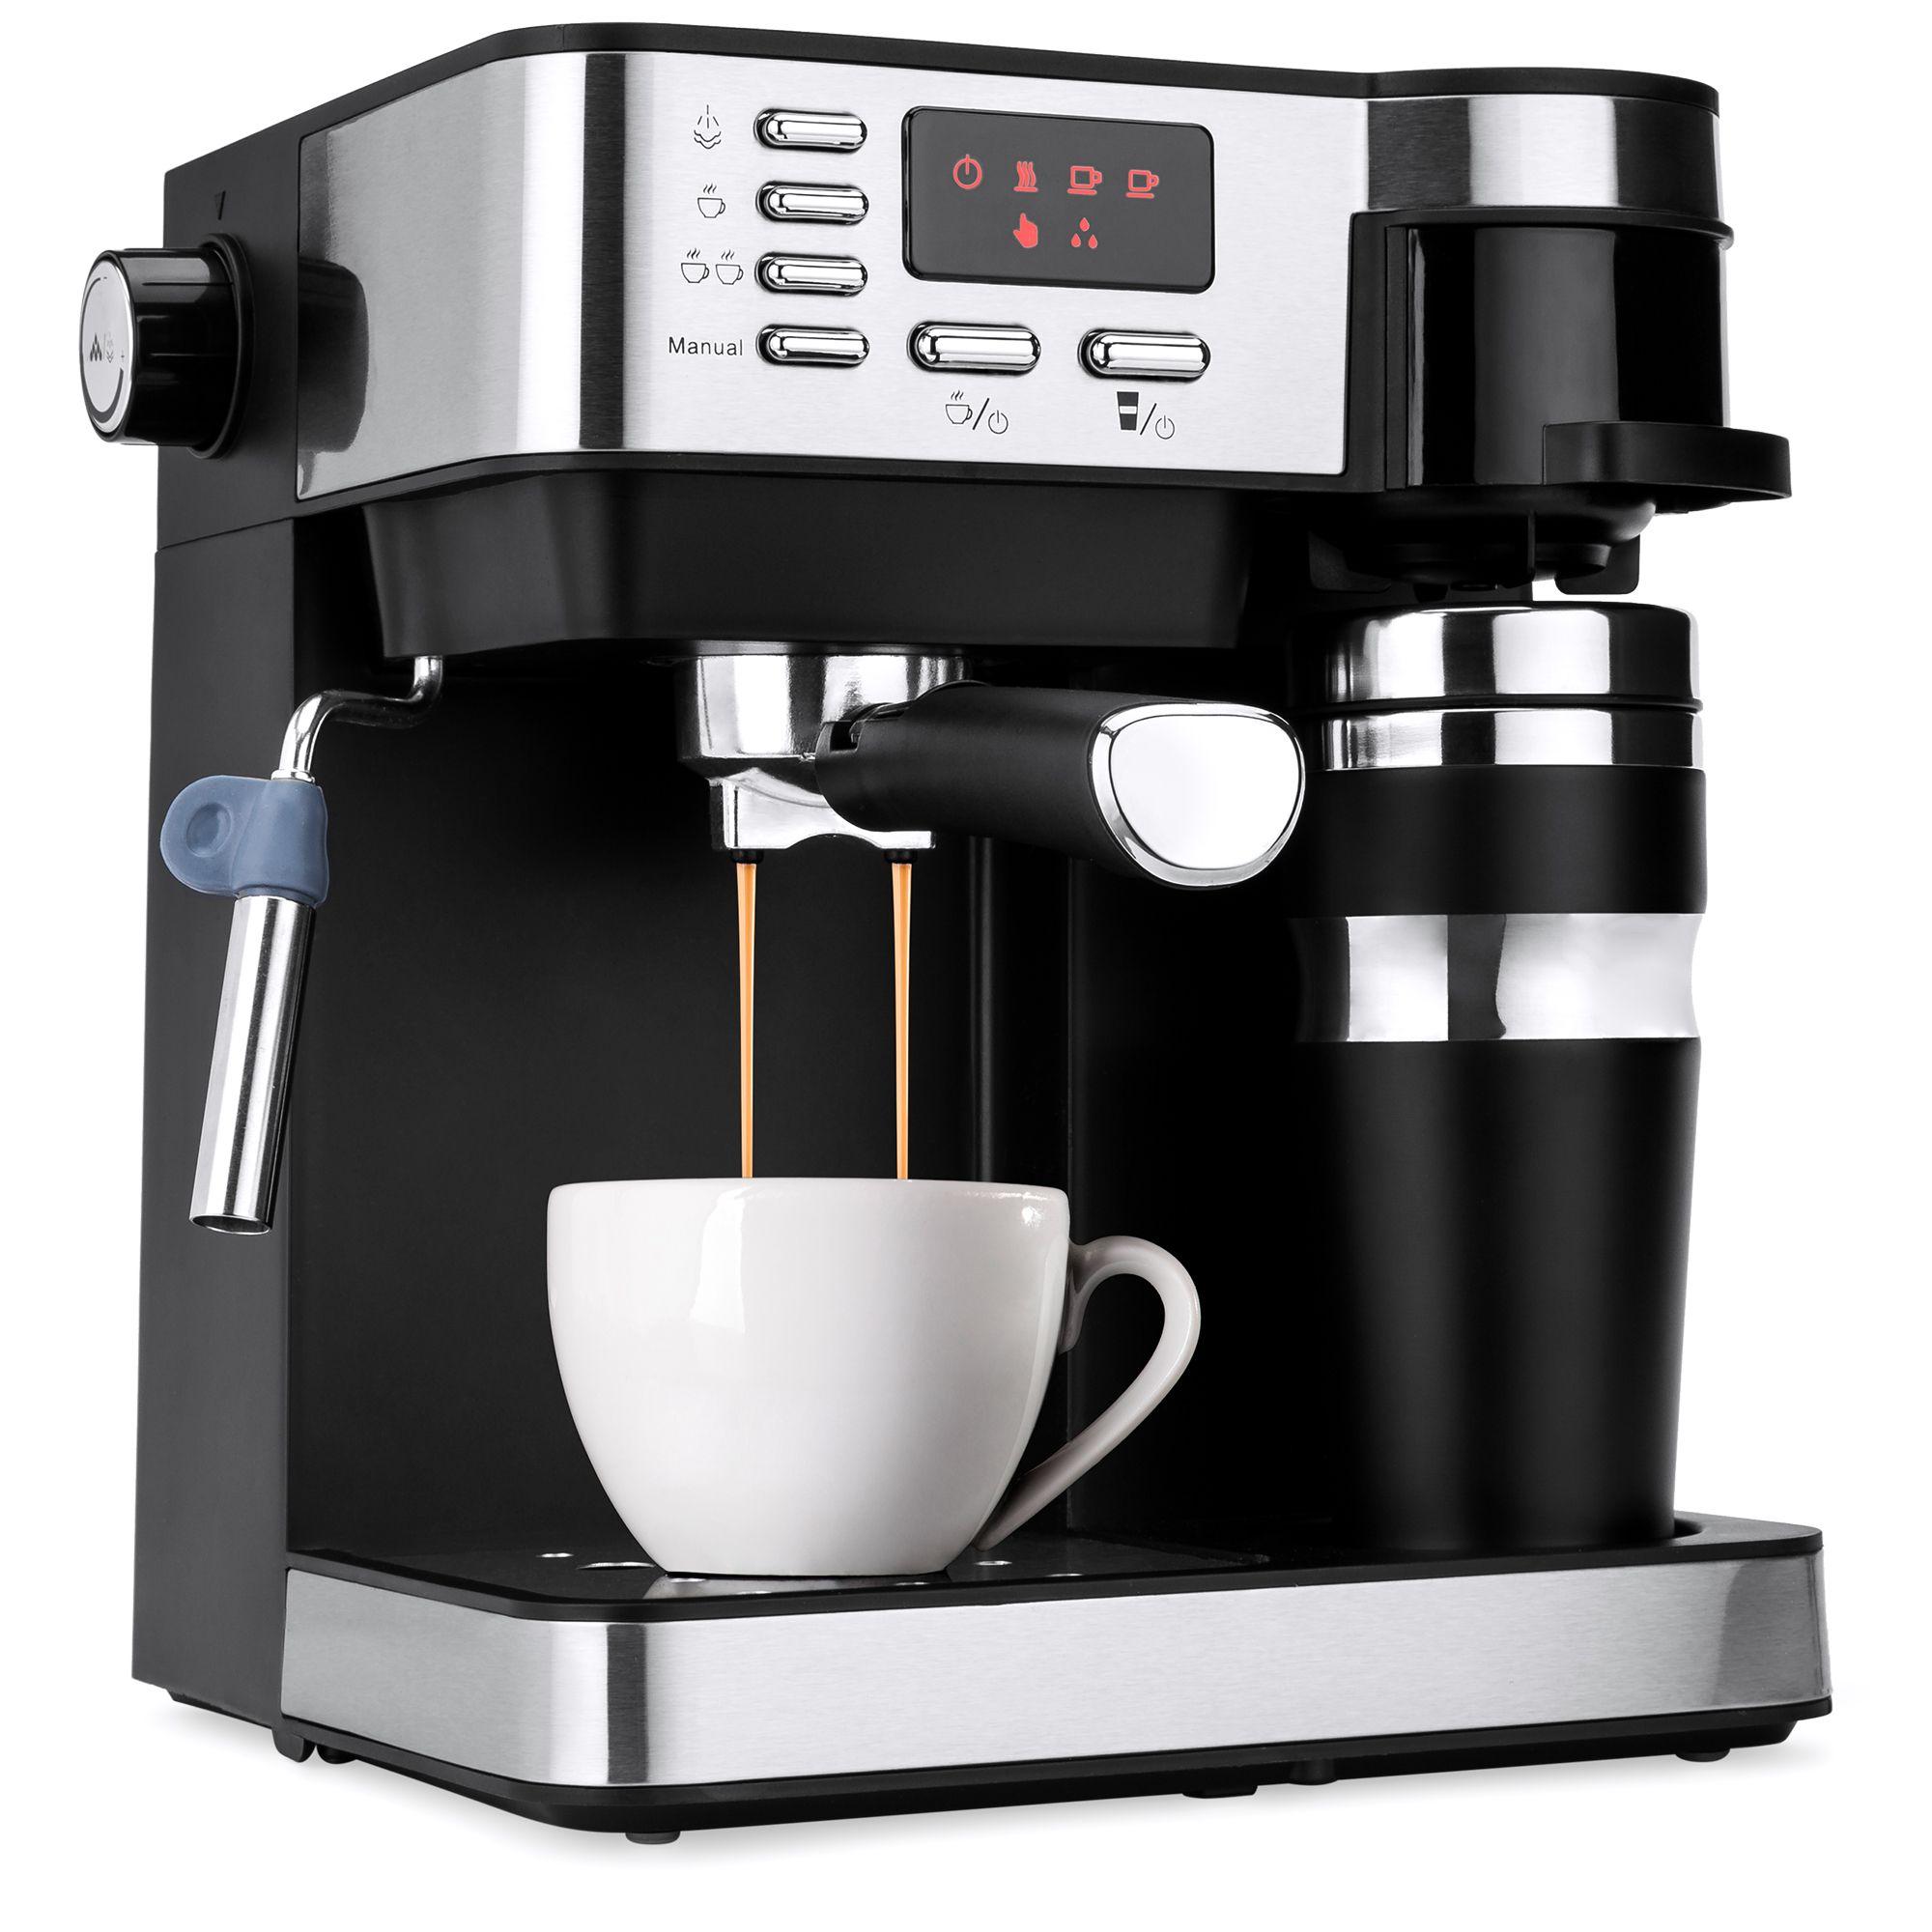 Home in 2020 Latte machine, Latte maker, Latte coffee maker